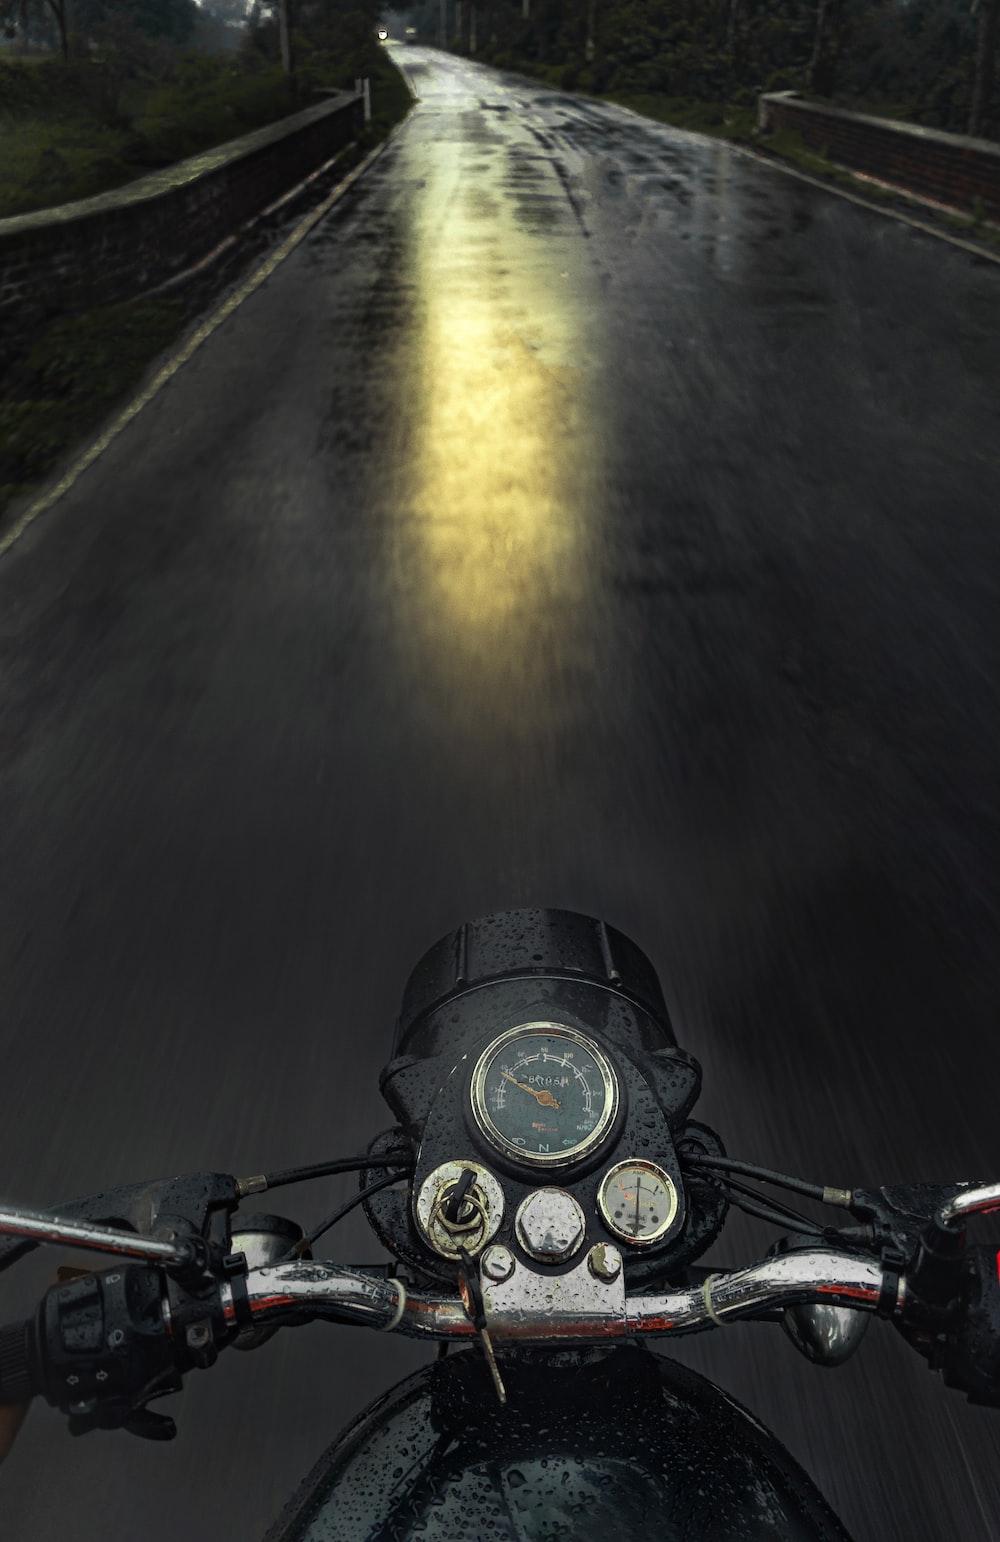 black motorcycle on road during daytime